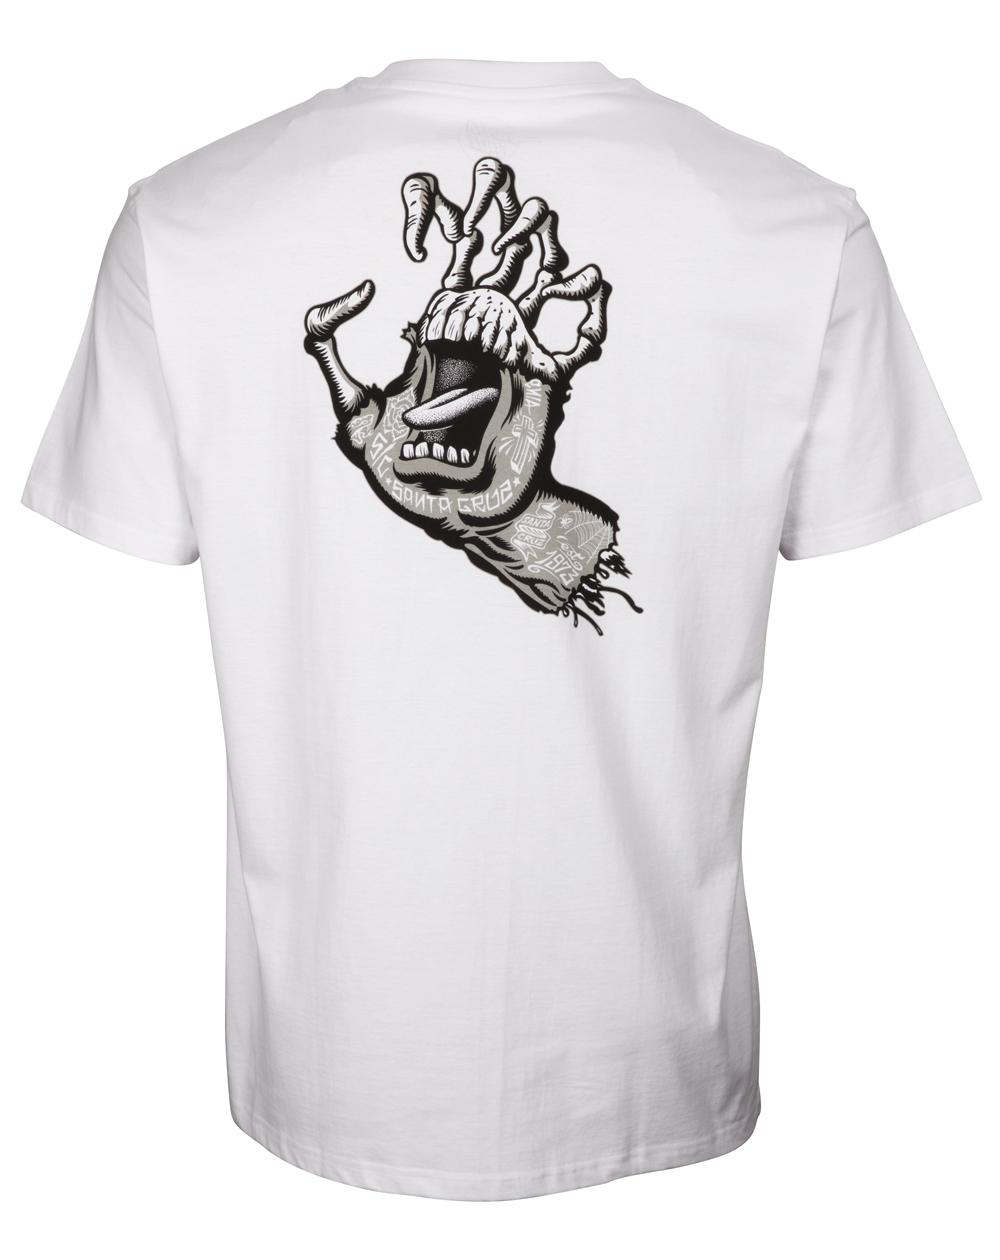 Santa Cruz Tattoo Hybrid Hand T-Shirt Homme White